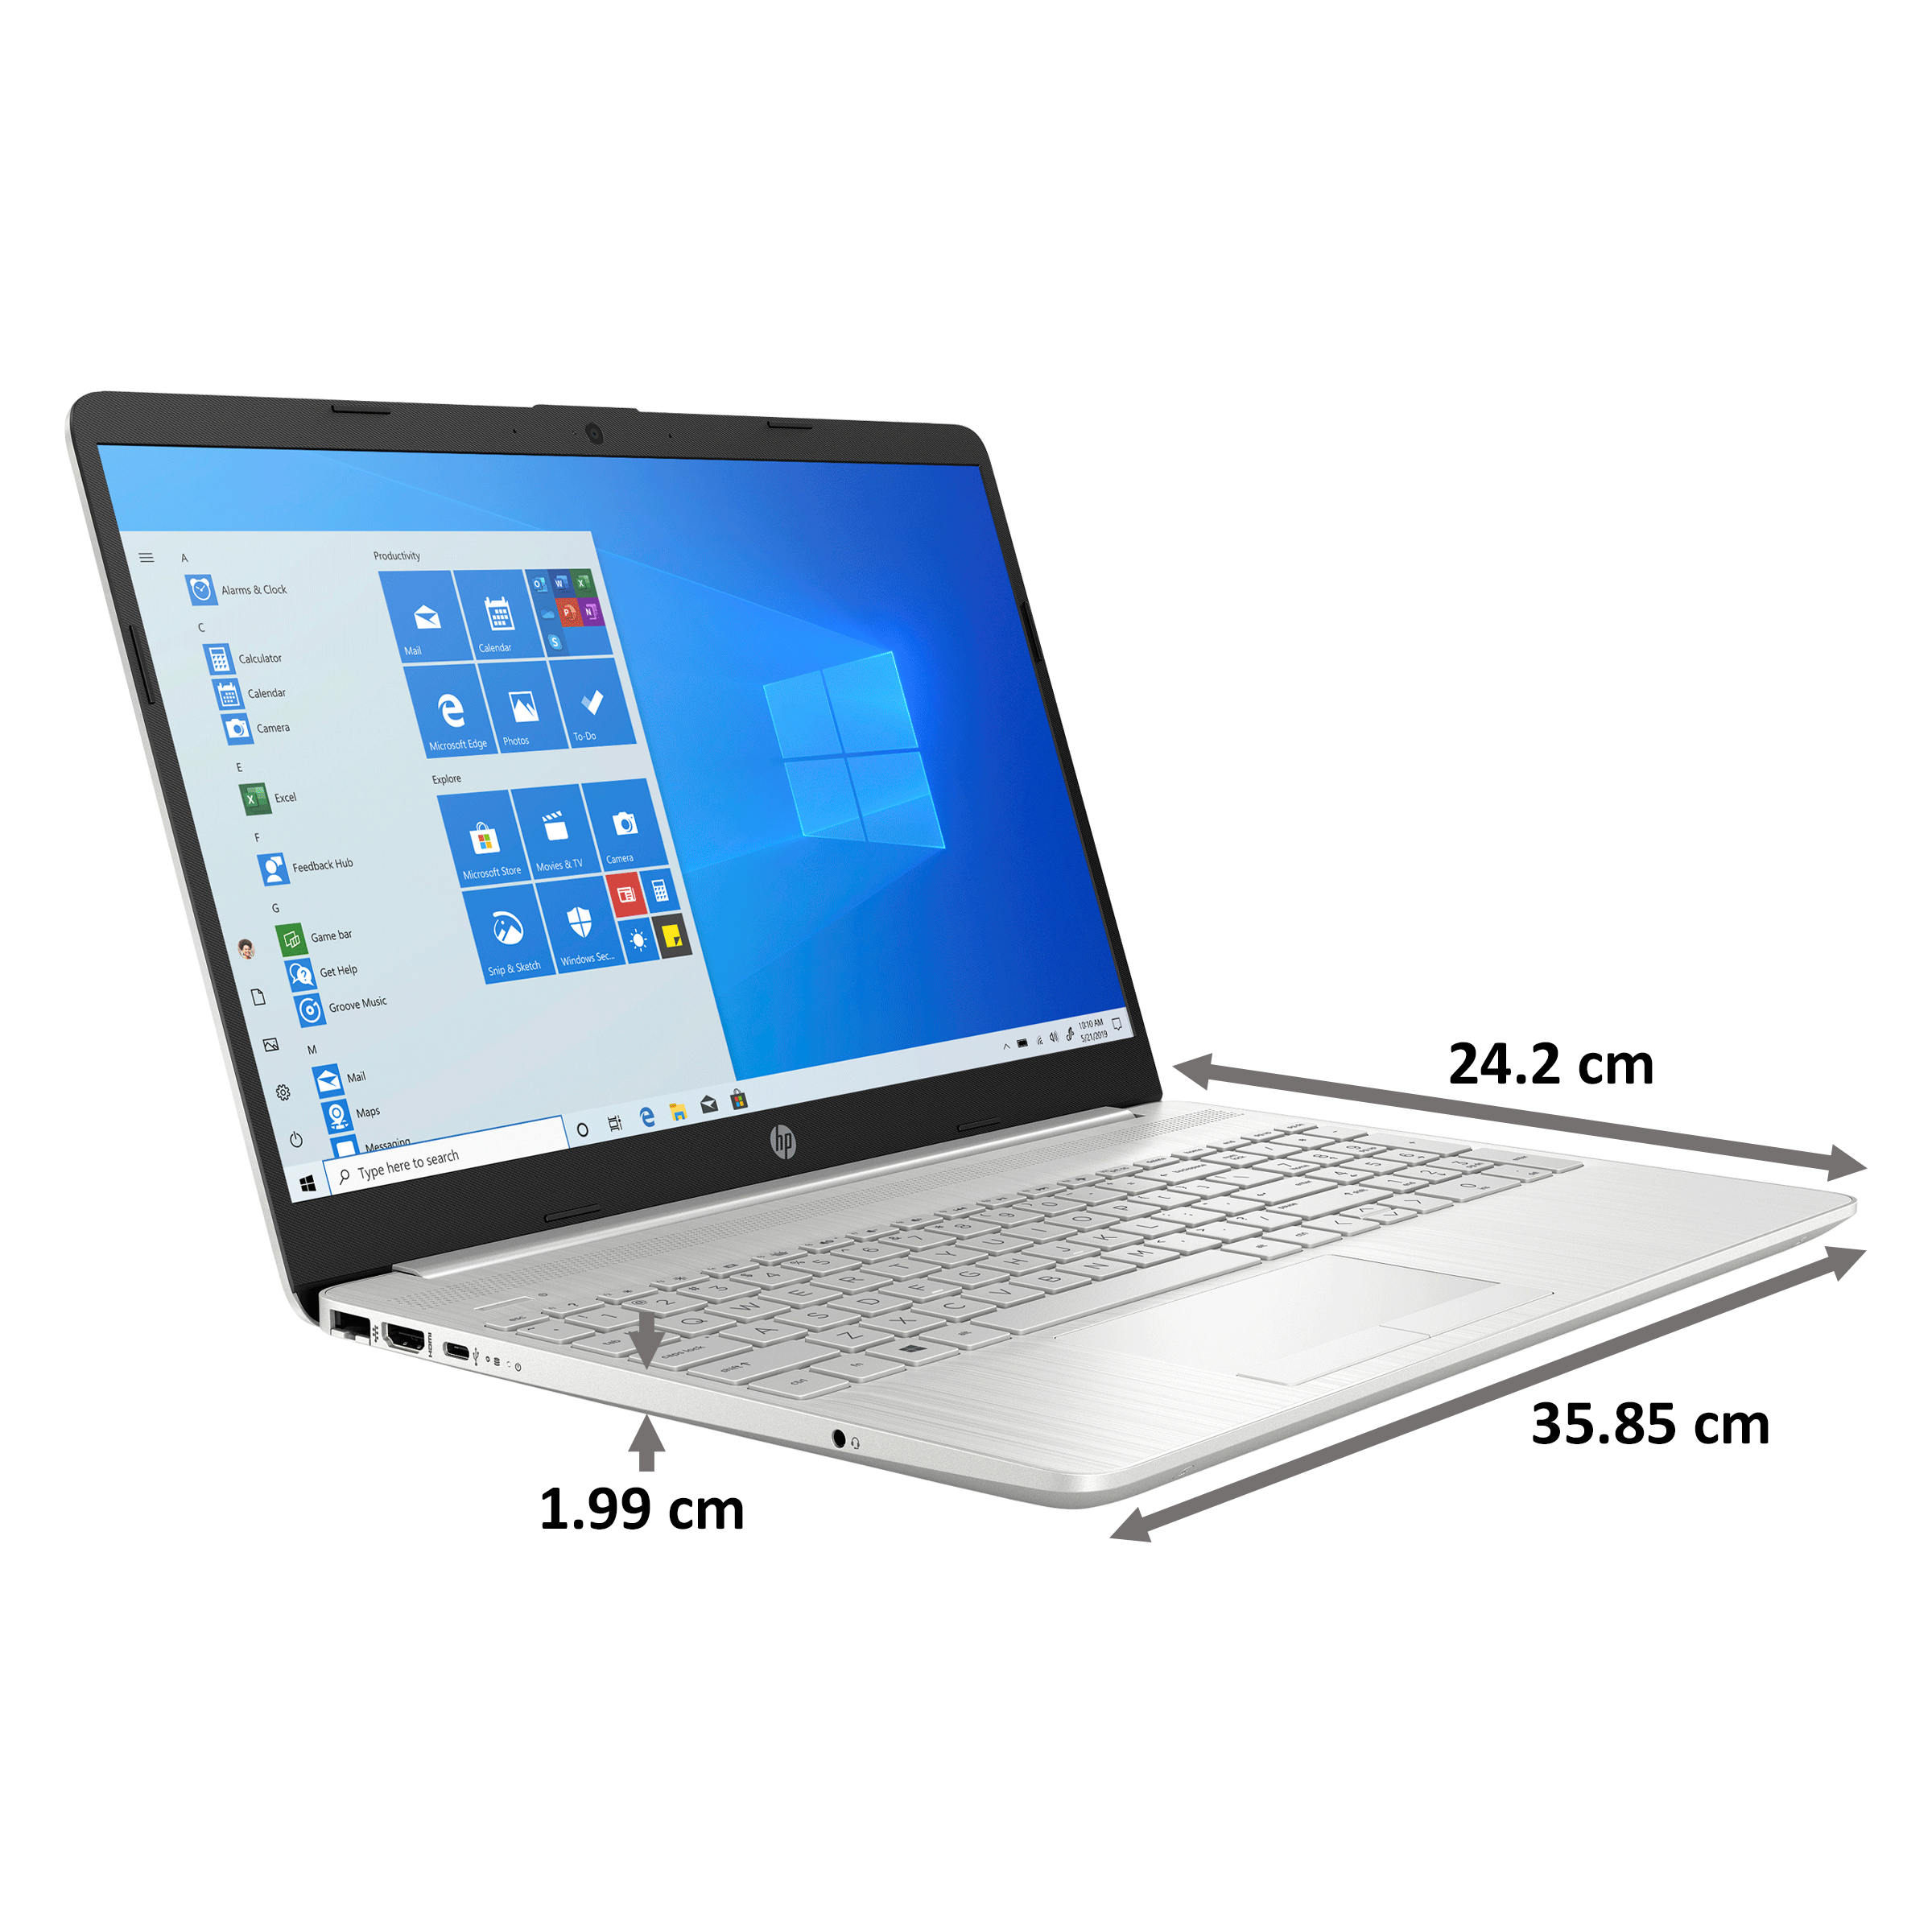 HP 15s-gr0500AU (440L7PA#ACJ) Ryzen 5 Windows 10 Home Laptop (8GB RAM, 512GB SSD, AMD Radeon Vega 8 Graphics, MS Office, 39.62cm, Natural Silver) 2